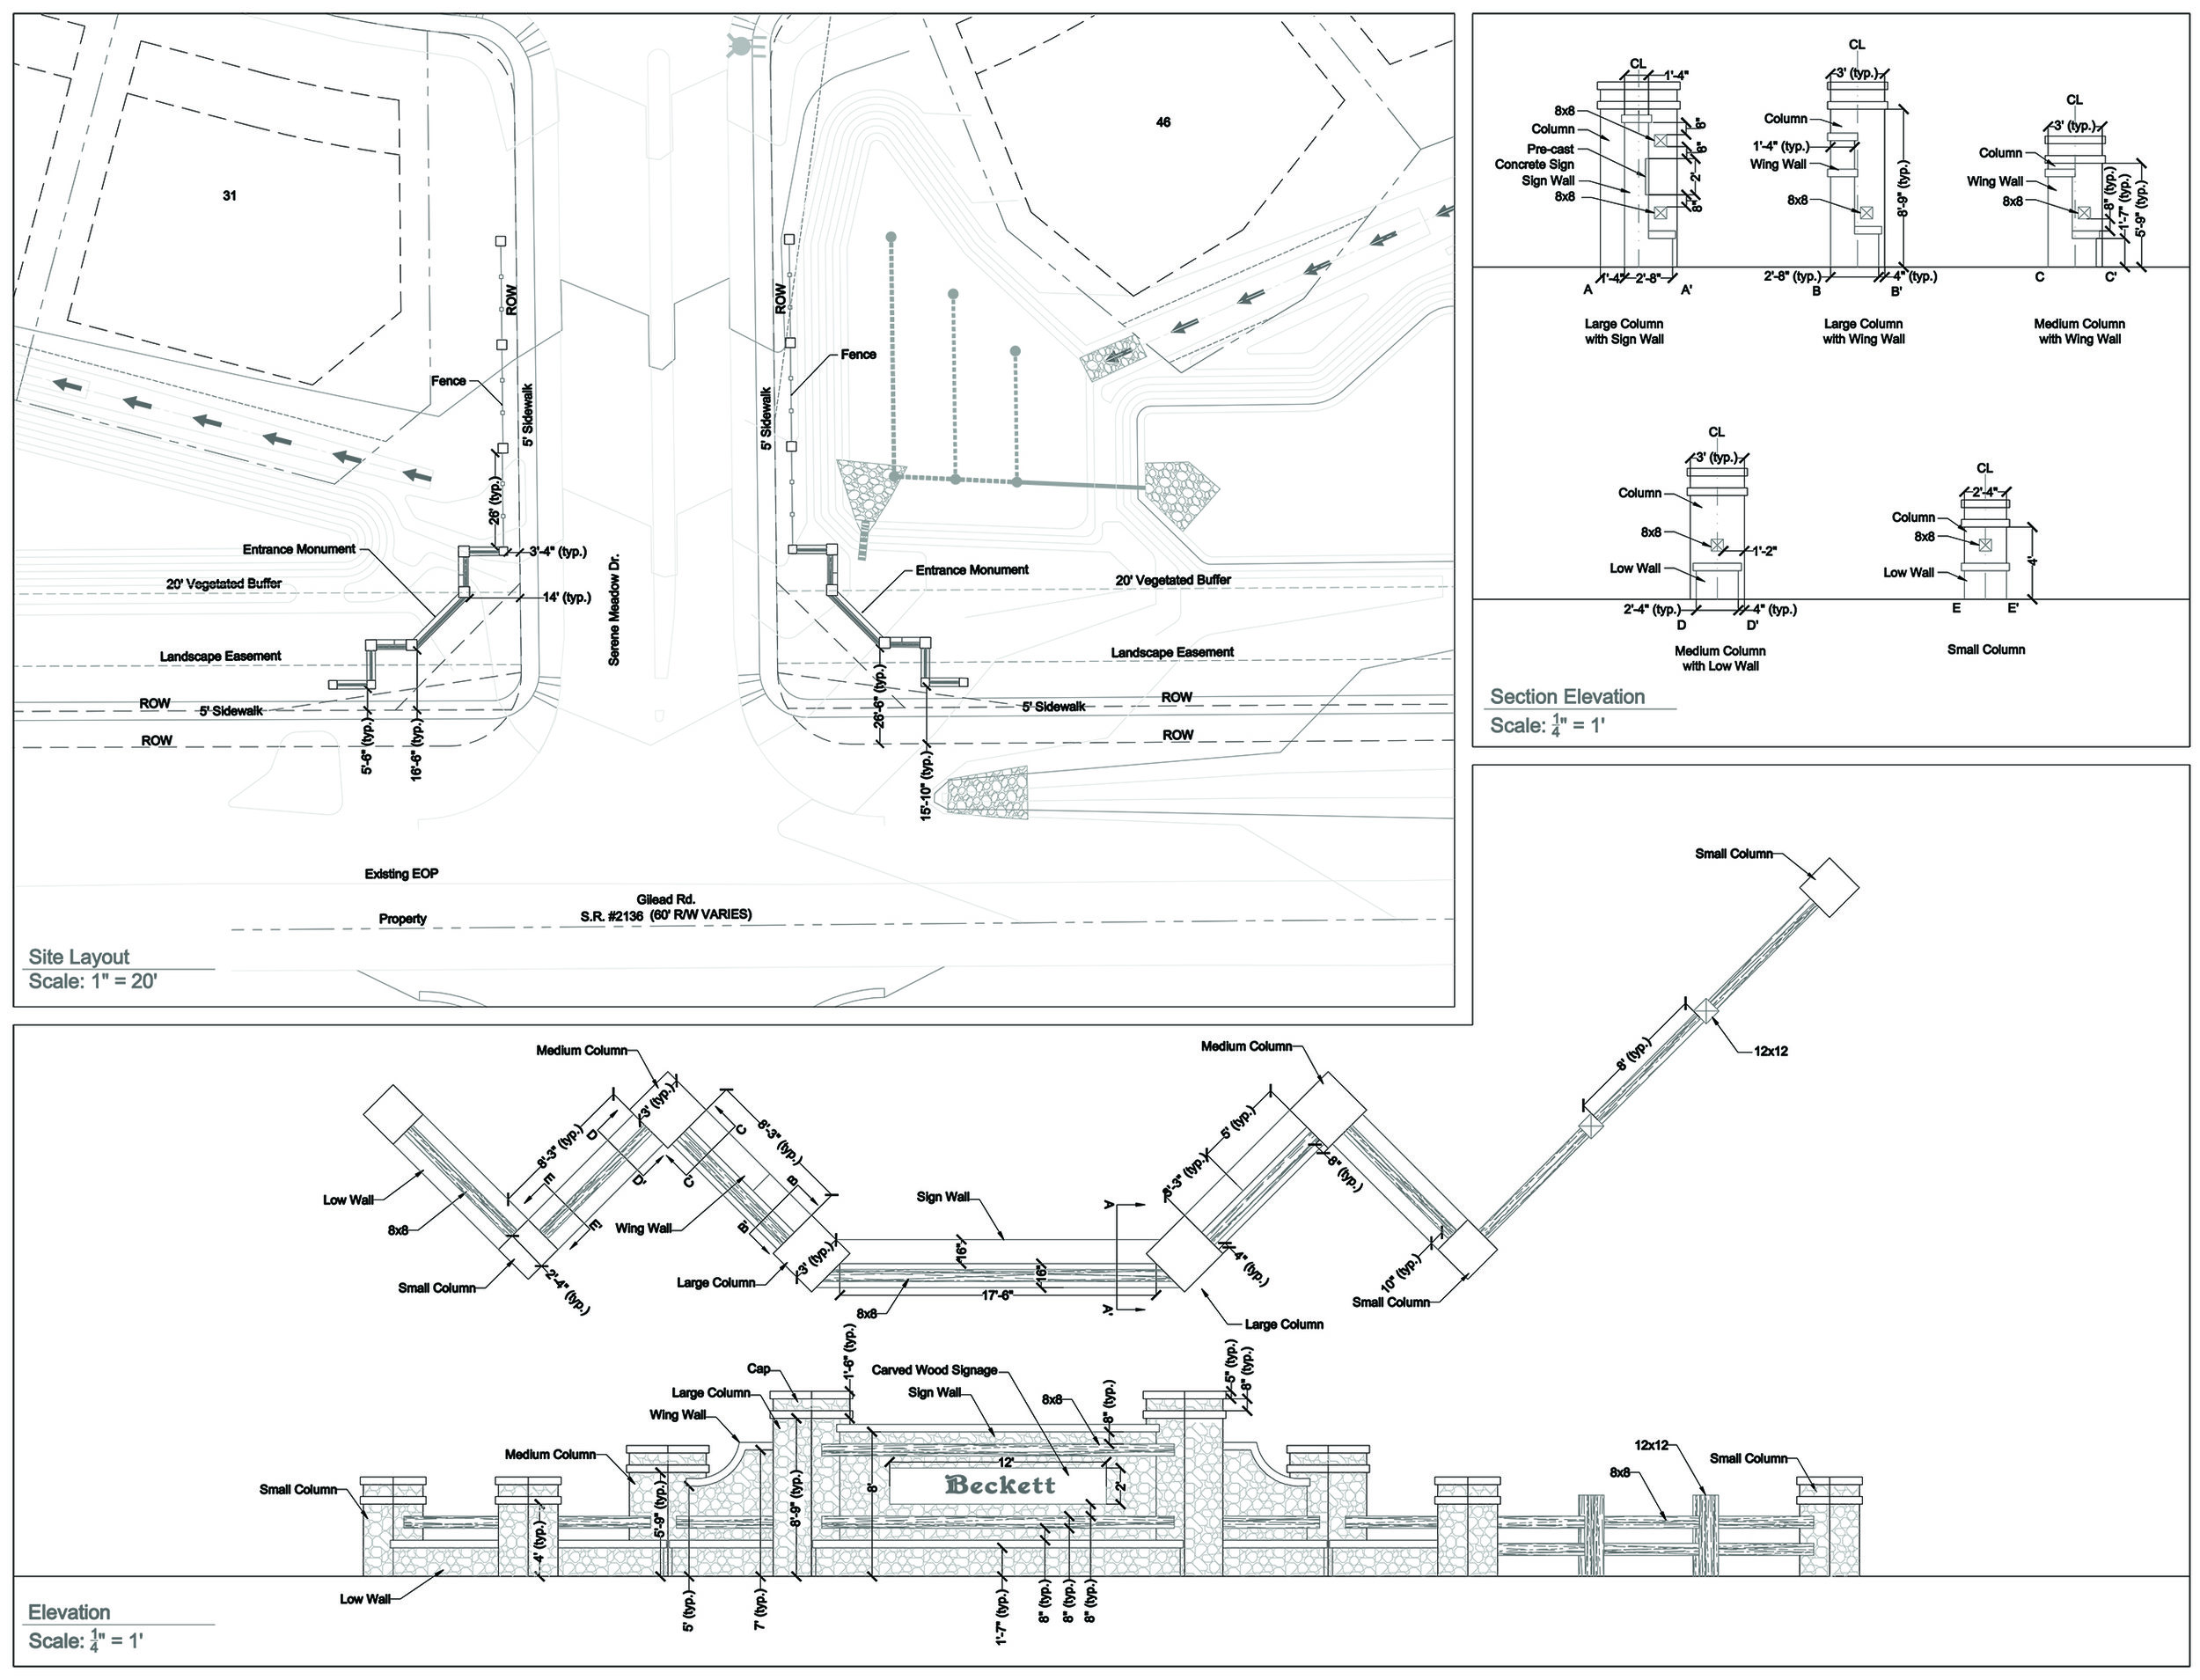 Monumentation, Logo, and Entrance Planting Design